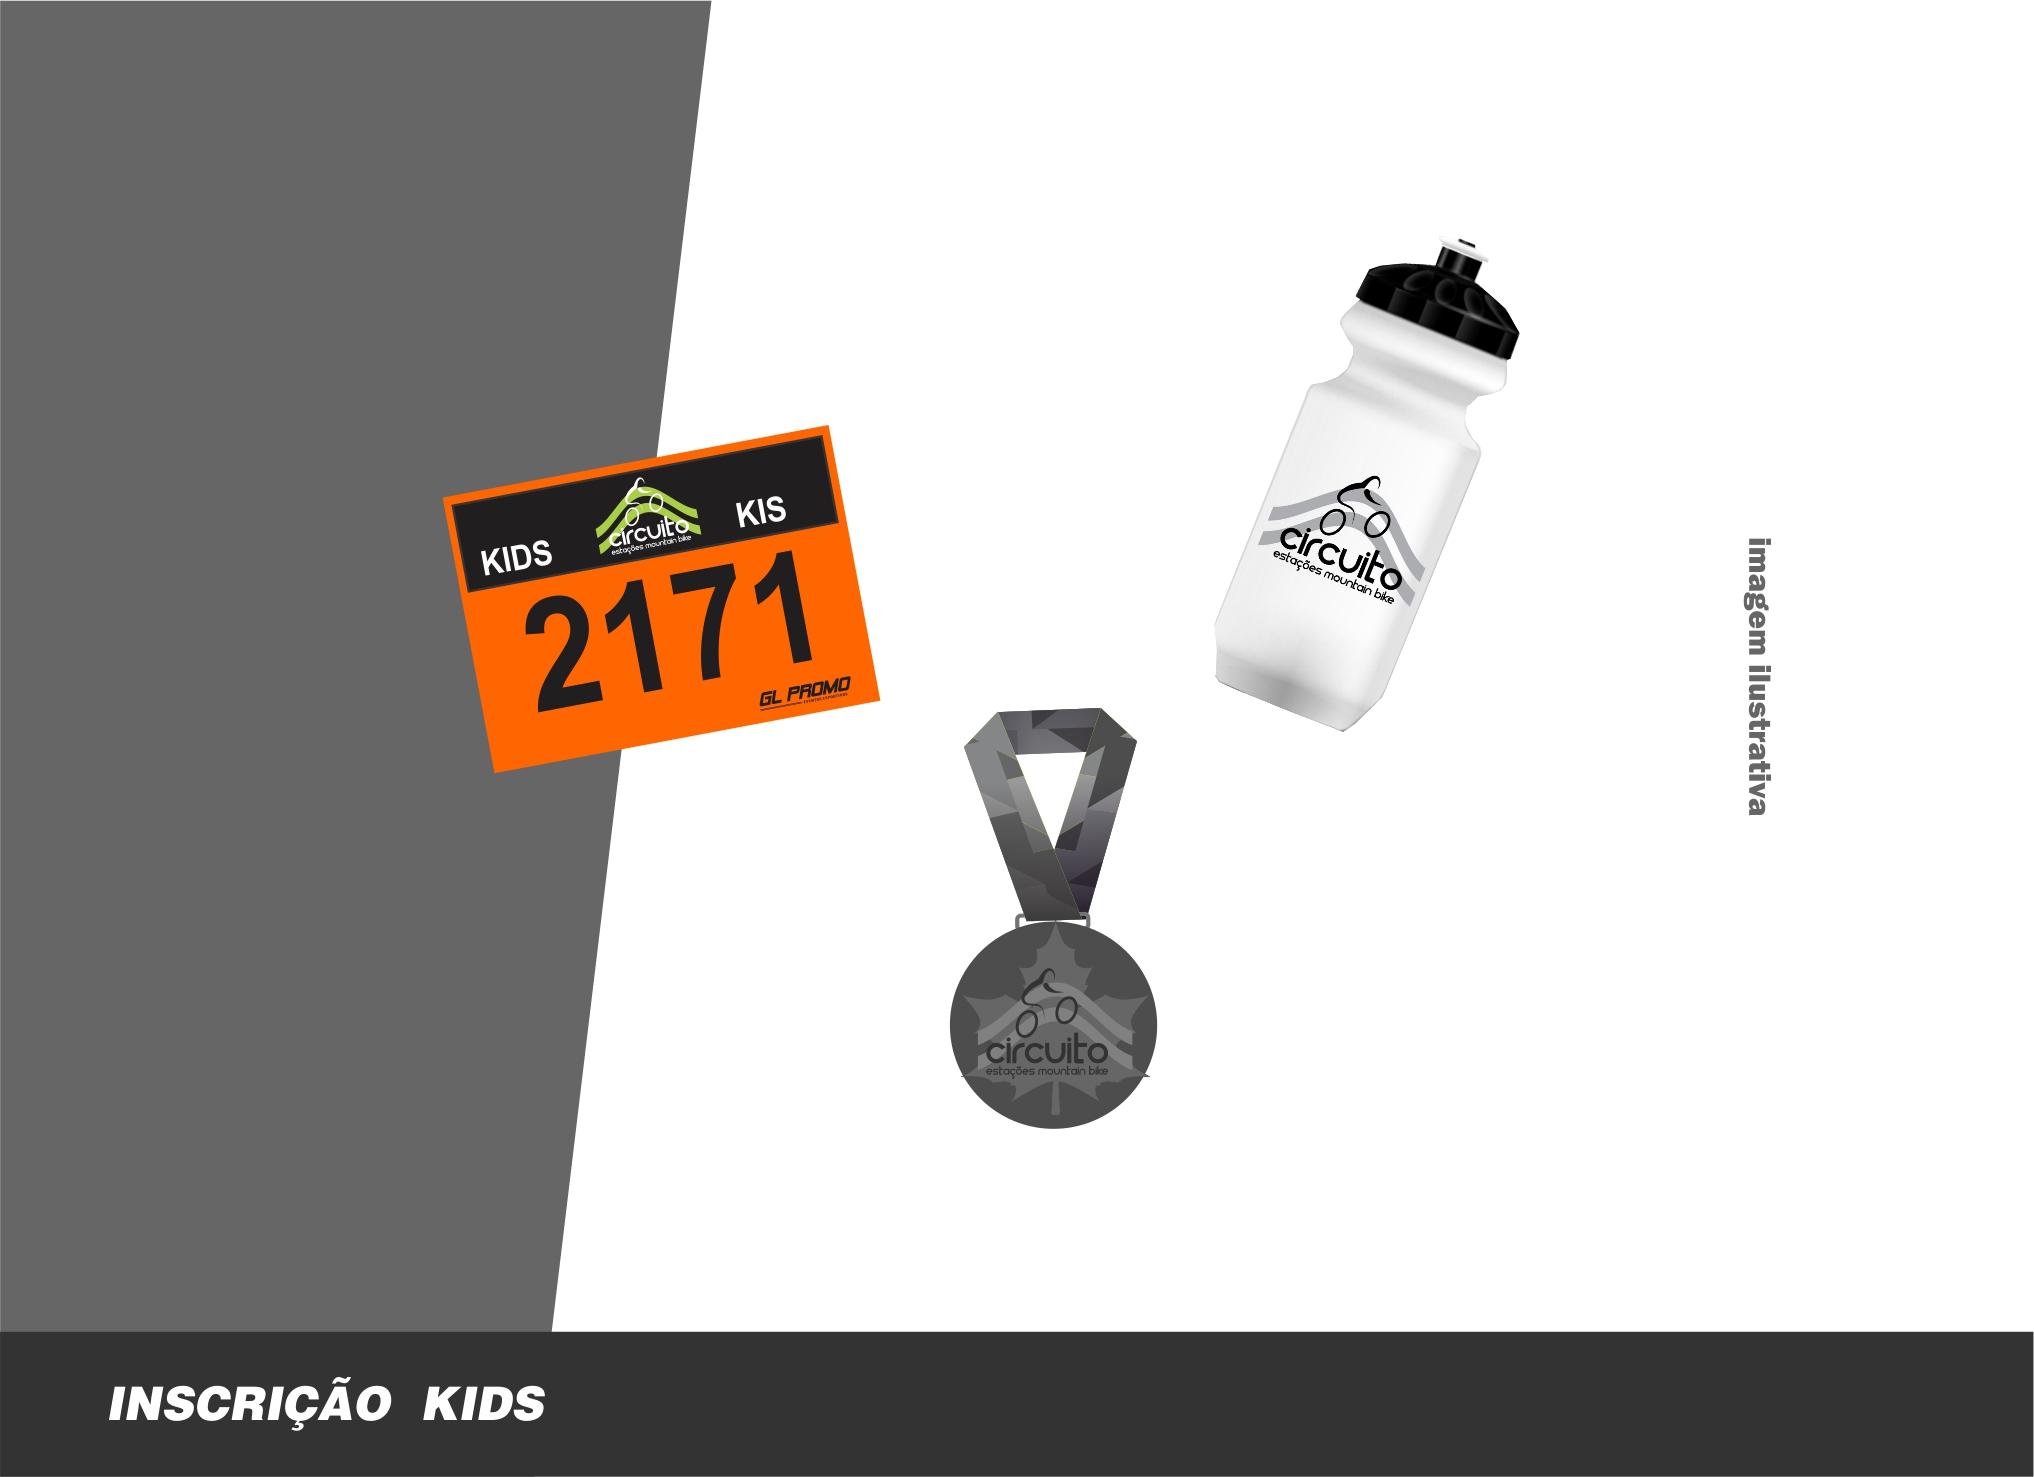 Kits Circuito Estações MTB - etapa outono